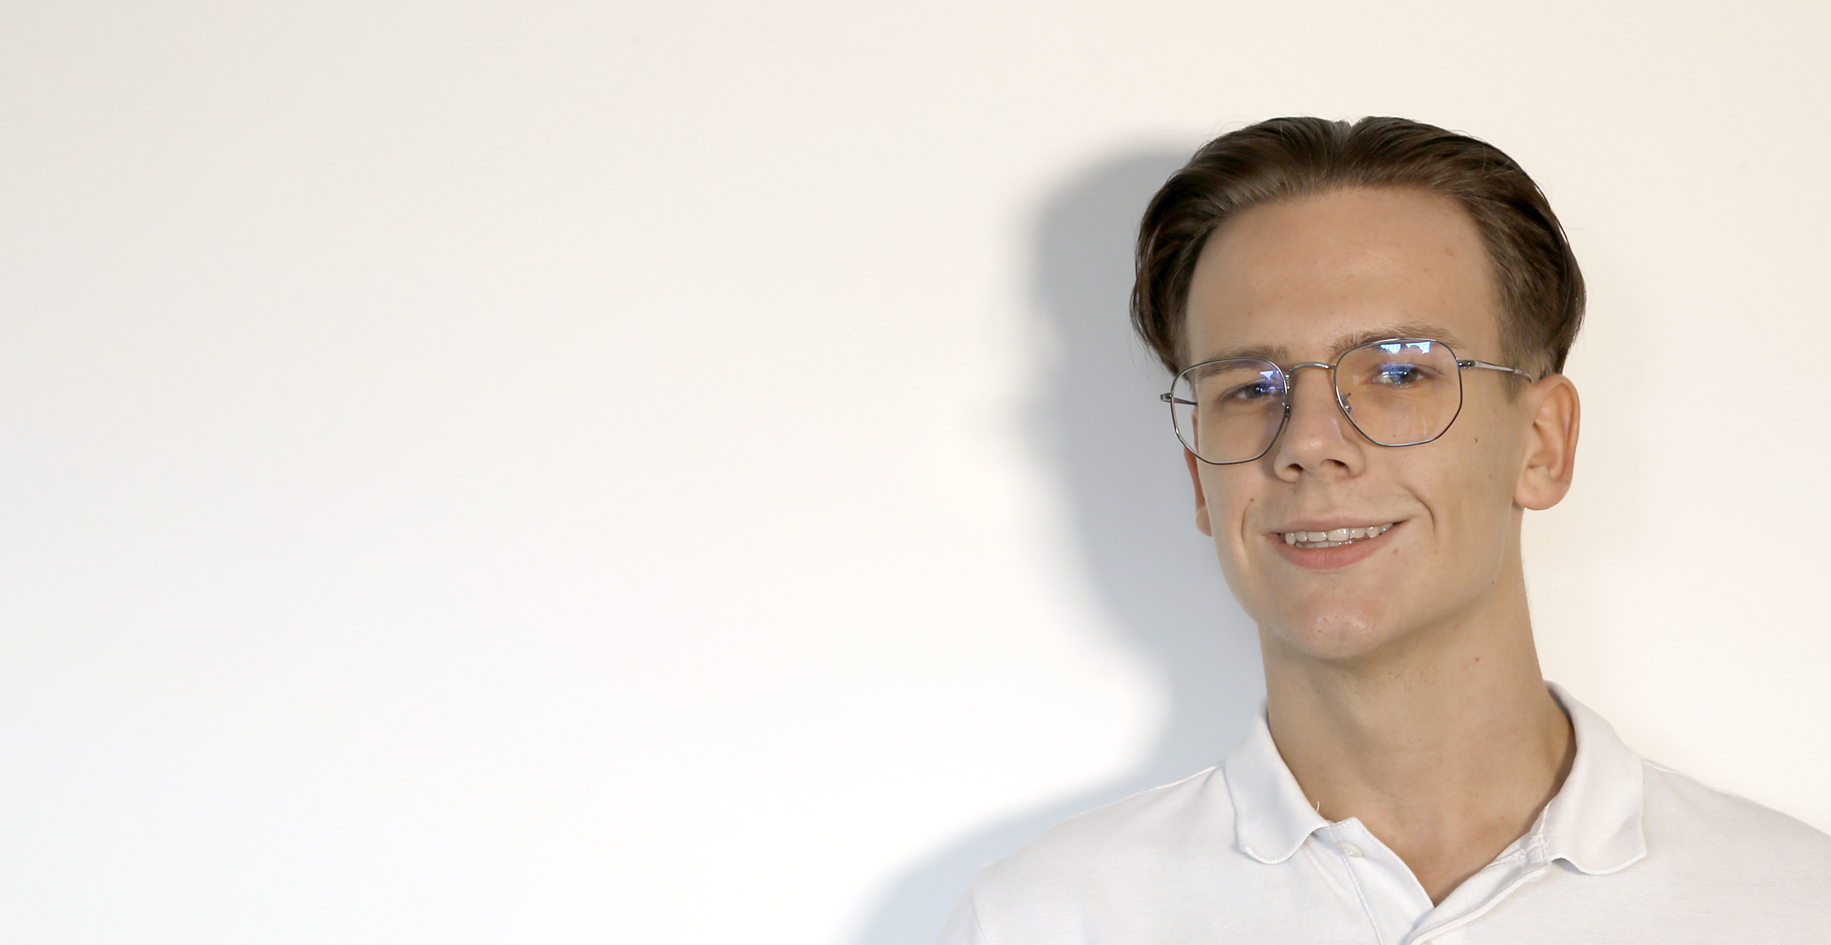 Dominik Kohn